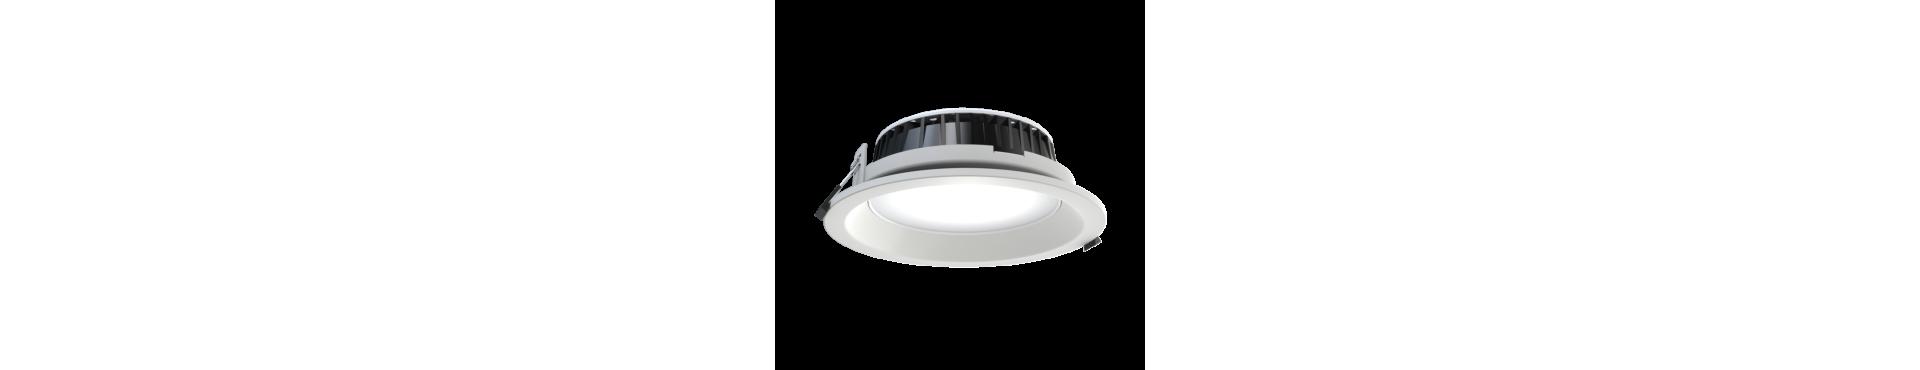 LED downlight - Køb direkte og Indirekte LED downlight